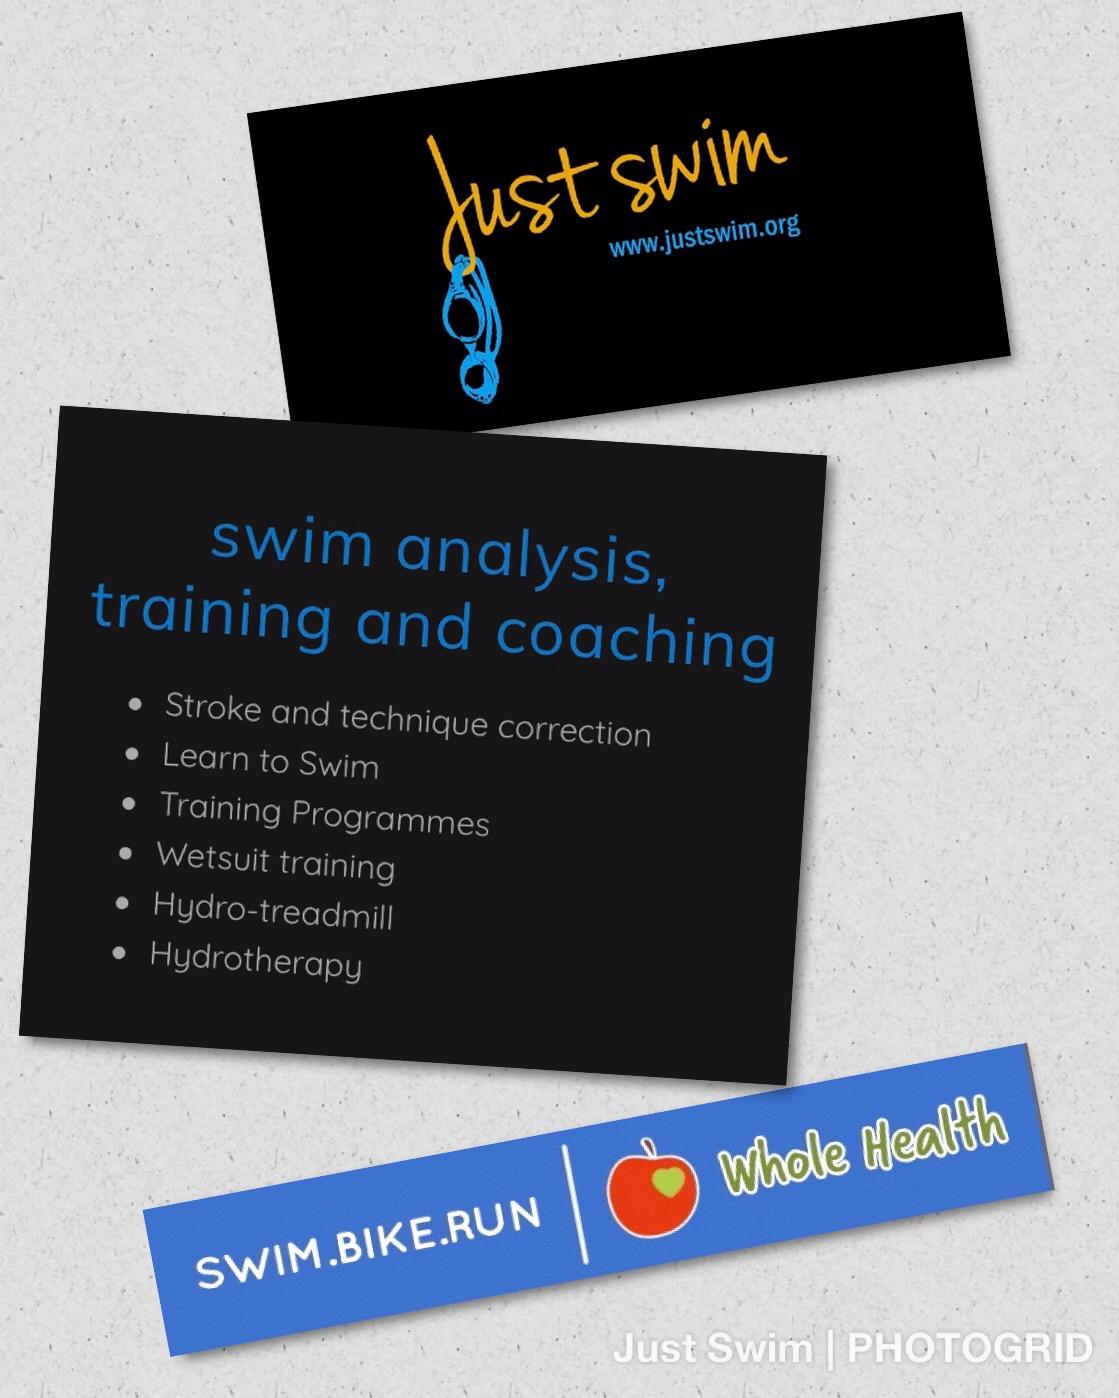 Just Swim Whole Health Booking App